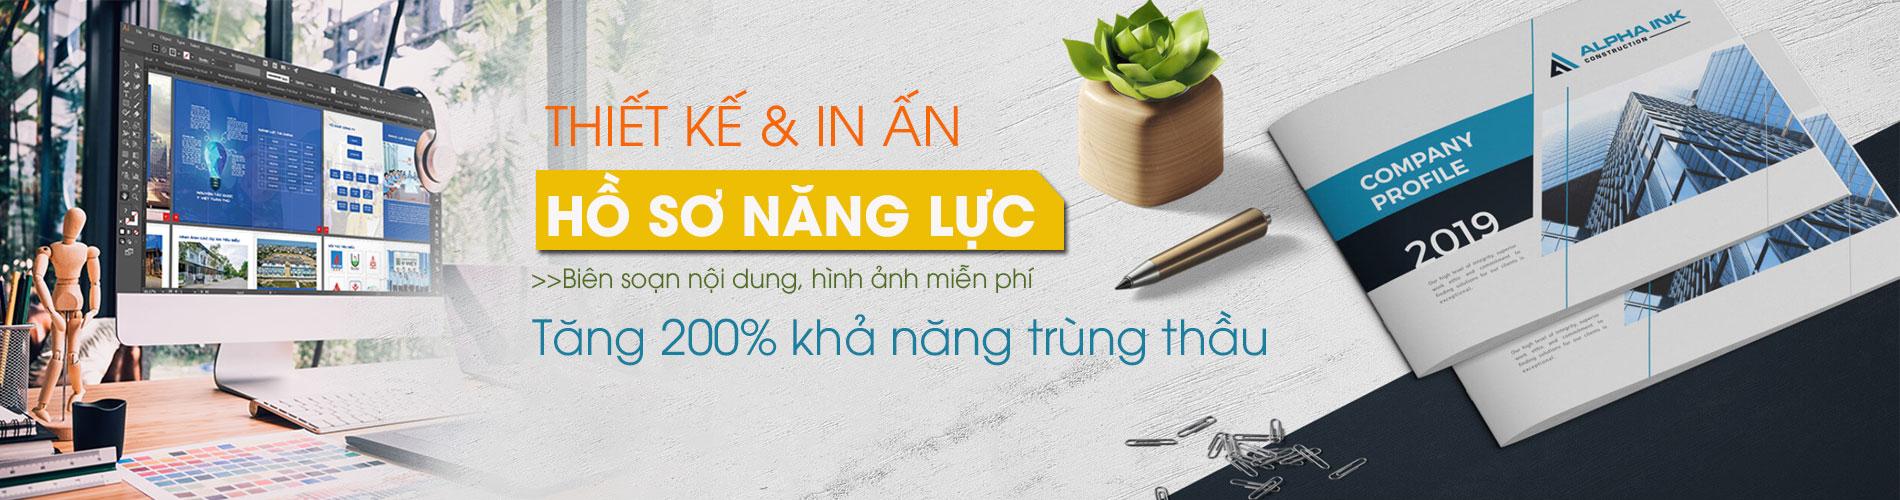 uploads/images/danh-muc-san-pham/banner-thiet-ke-ho-so-nang-luc3.jpg